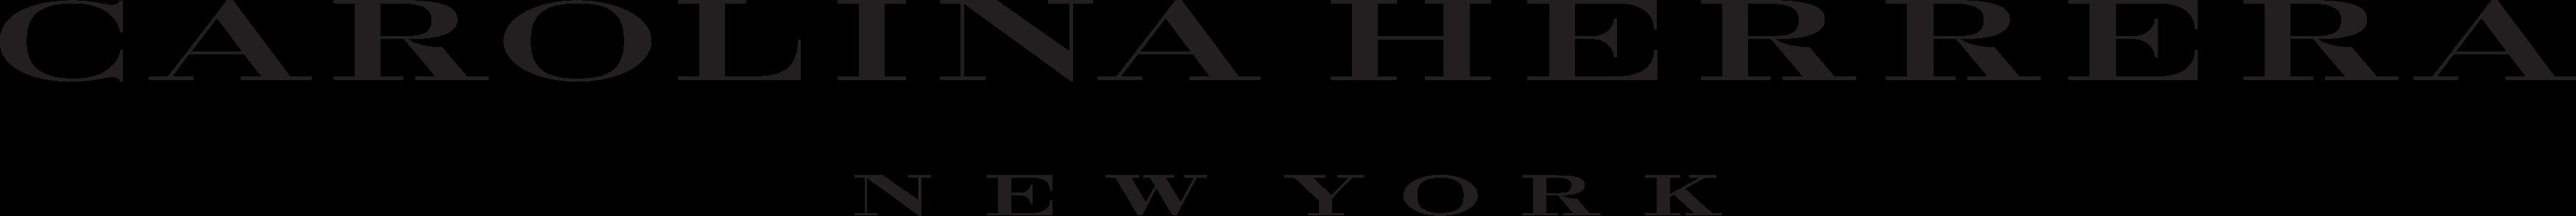 Carolina Herrera Logo.